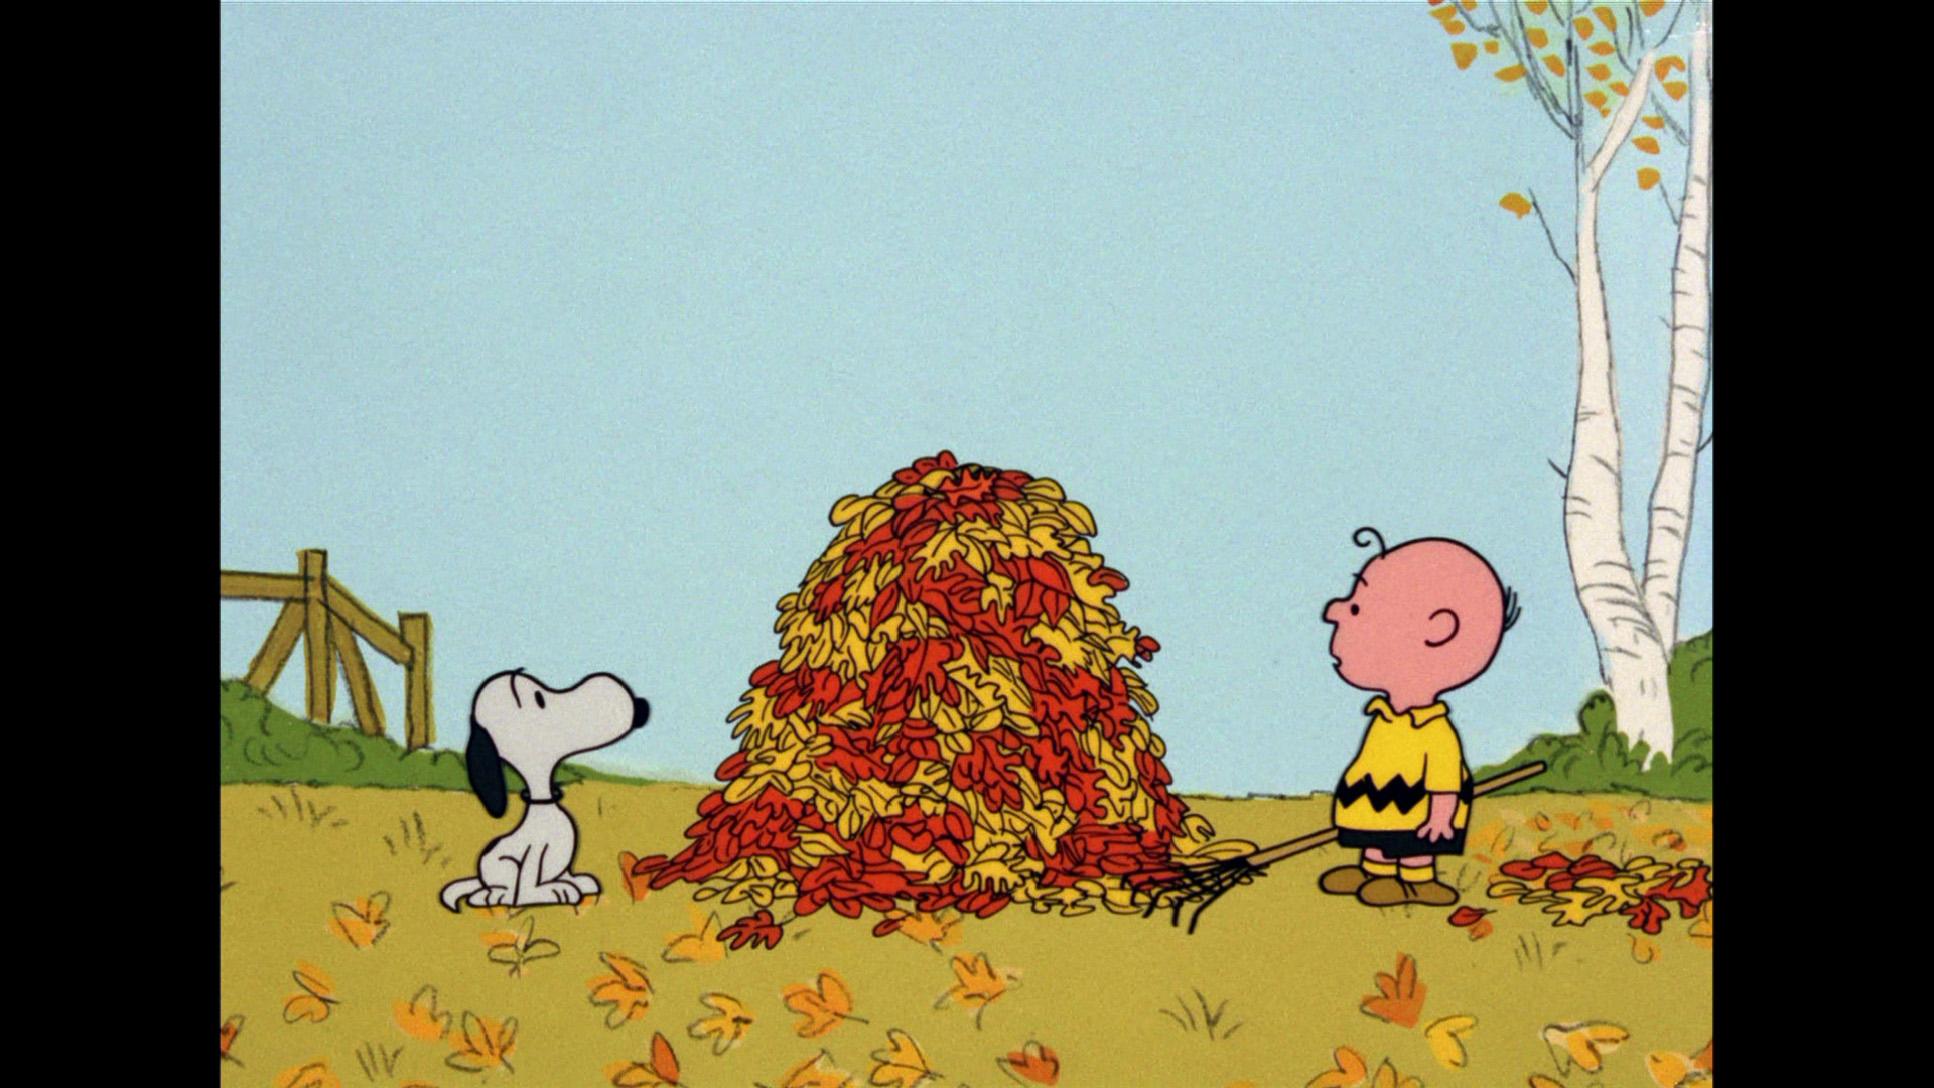 Free Snoopy Fall Wallpaper Great Pumpkin Charlie Brown Wallpapers Hd Pixelstalk Net